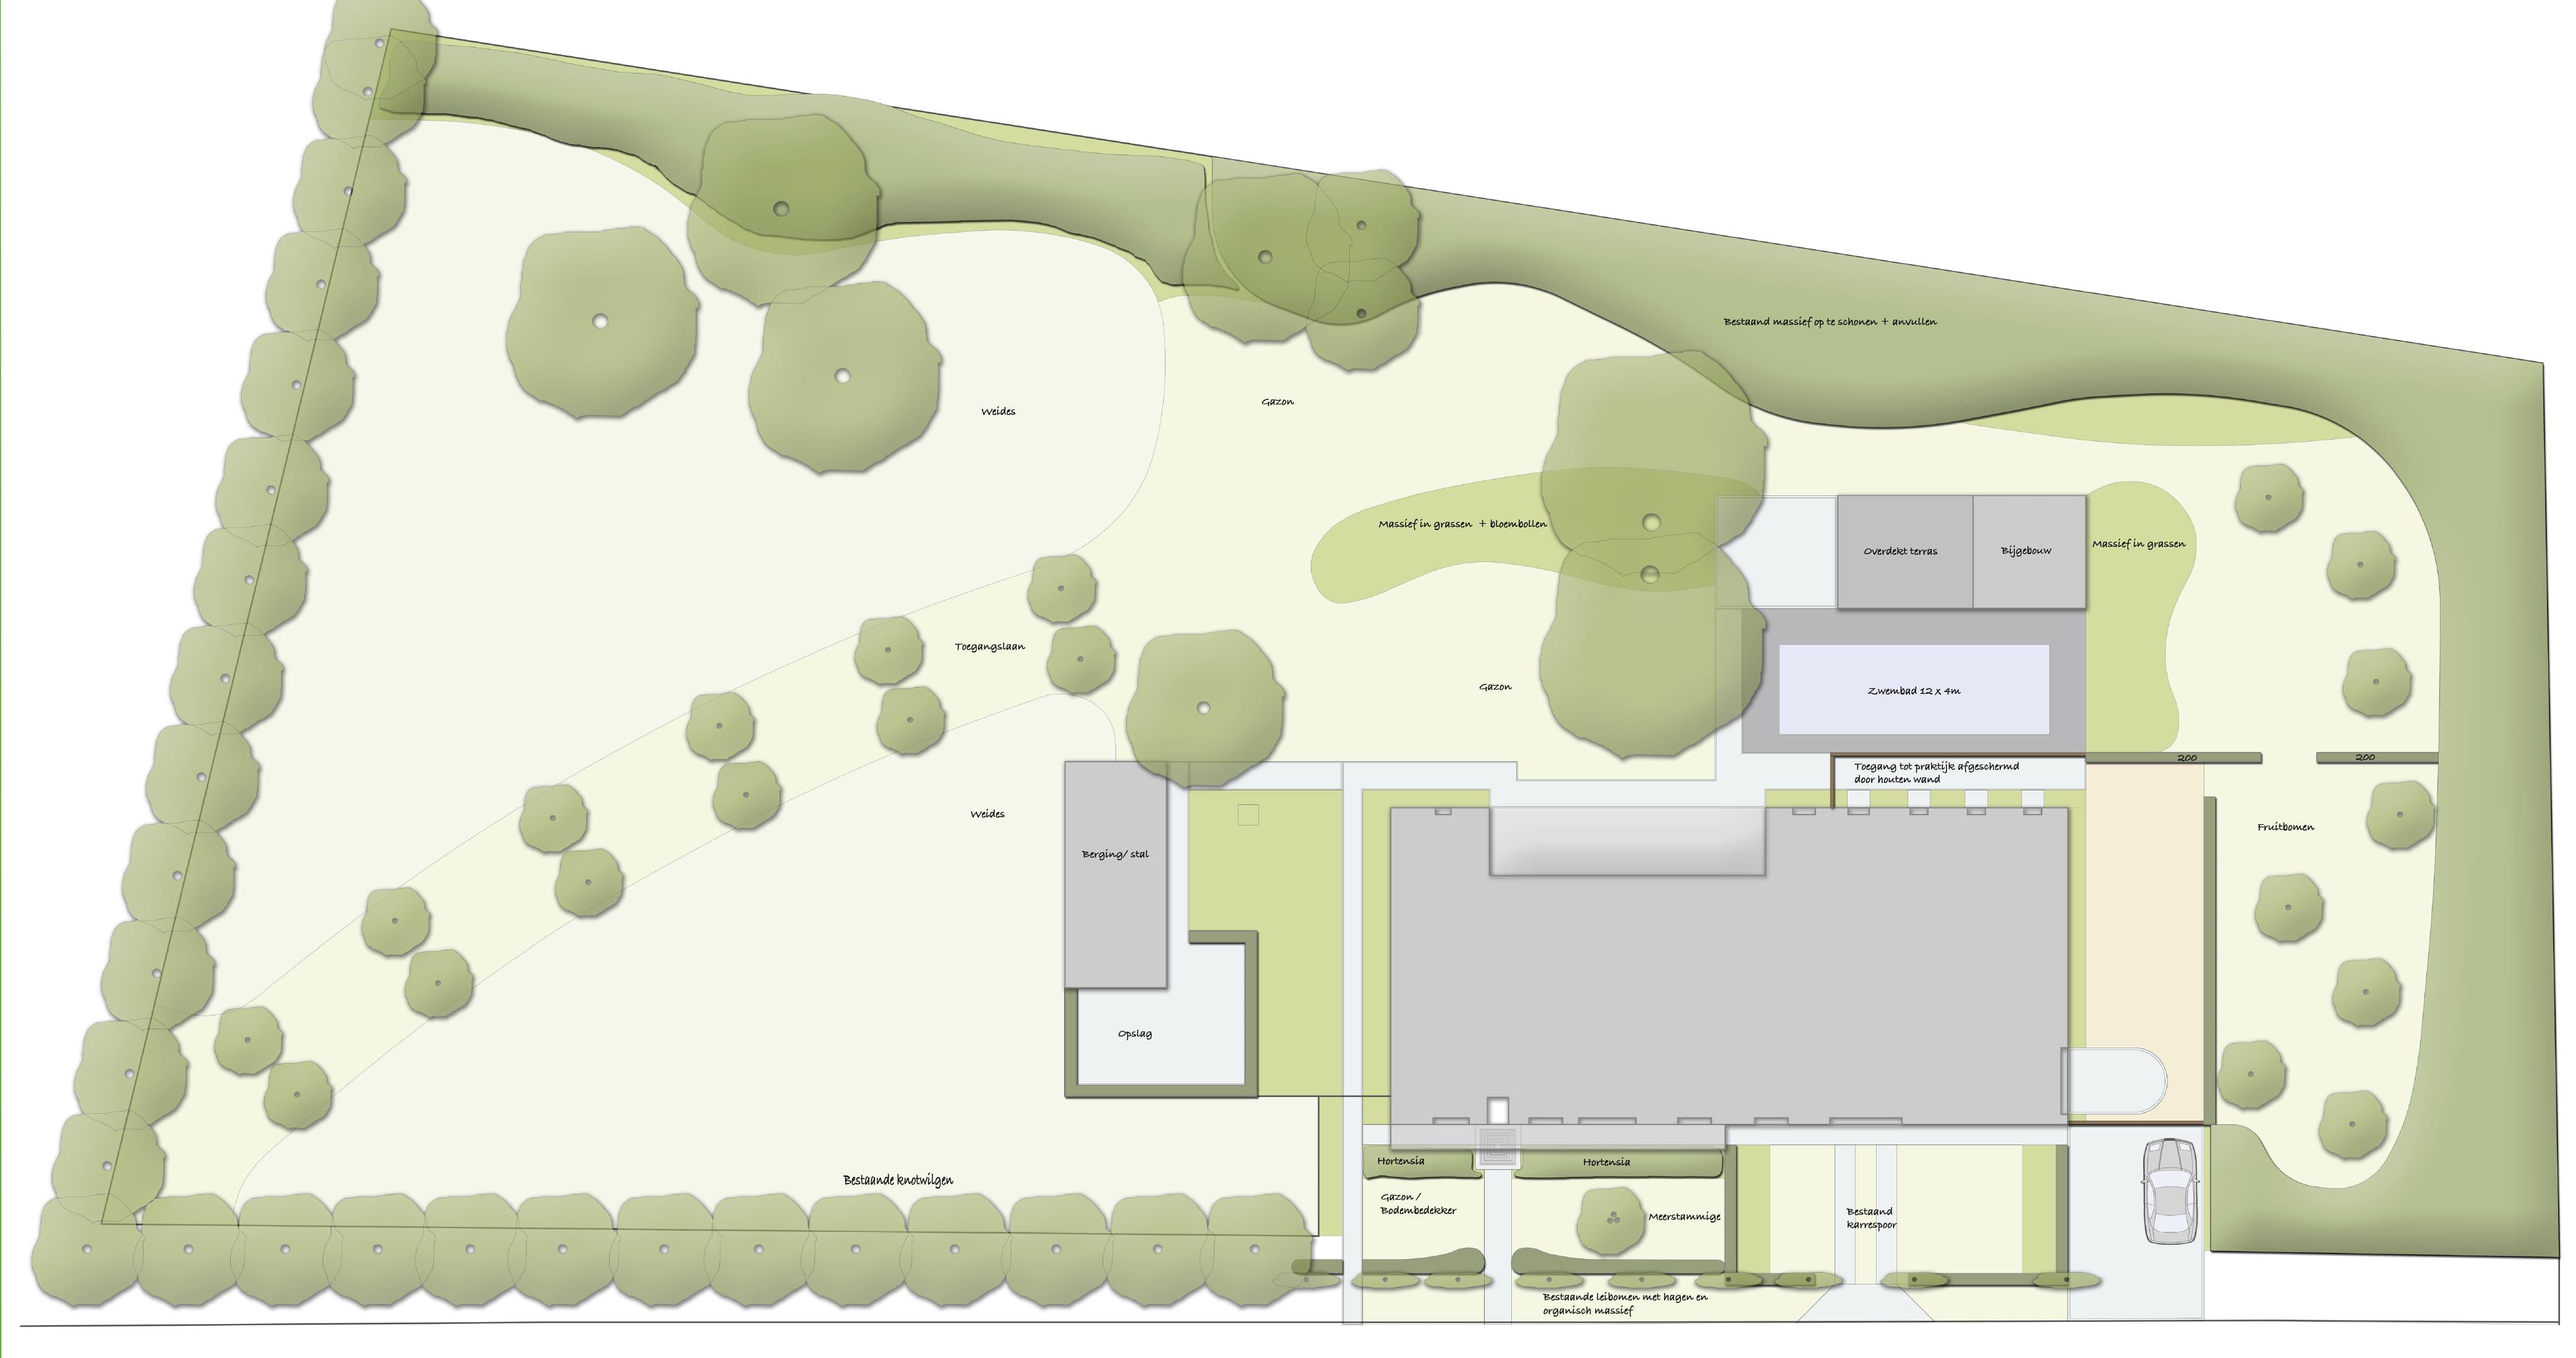 Tuinarchitectuur - Cis Van der Linden Tuinaanneming en -Architectuur